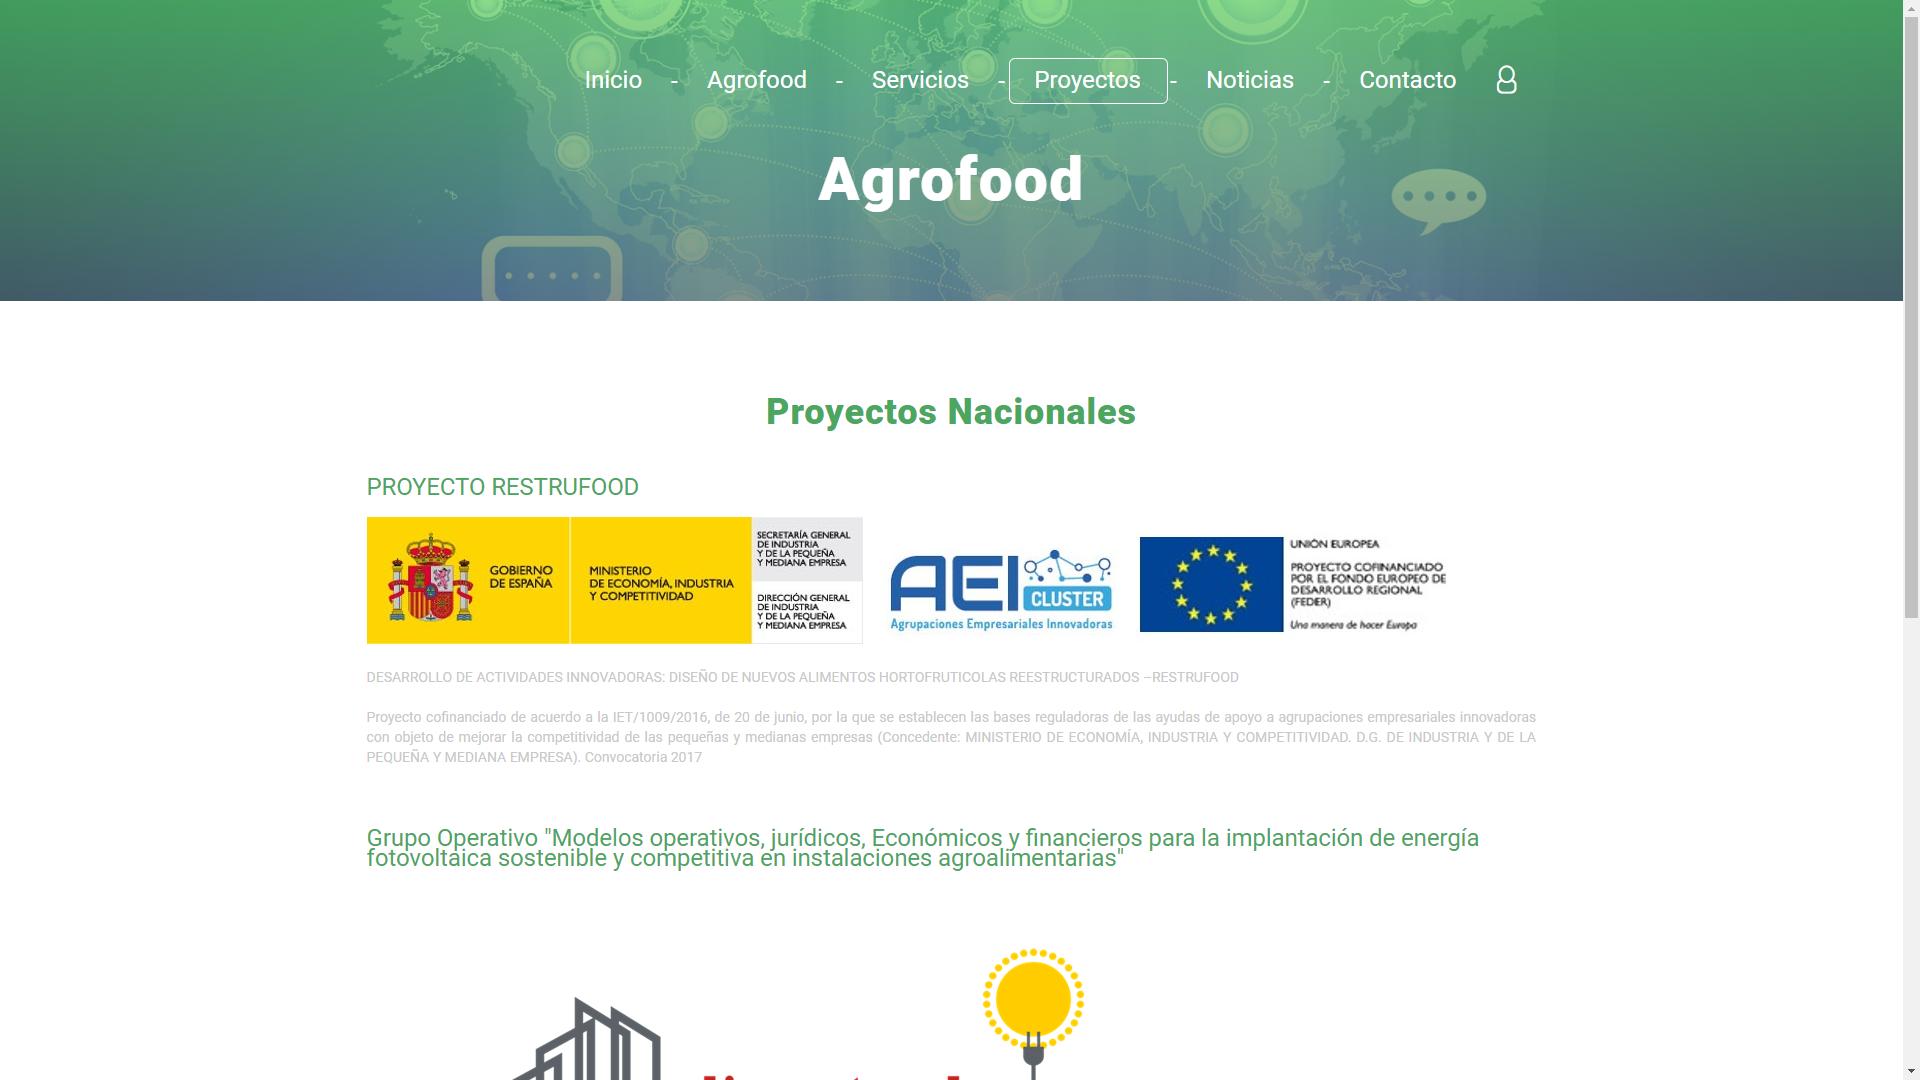 agrofood_proyectos